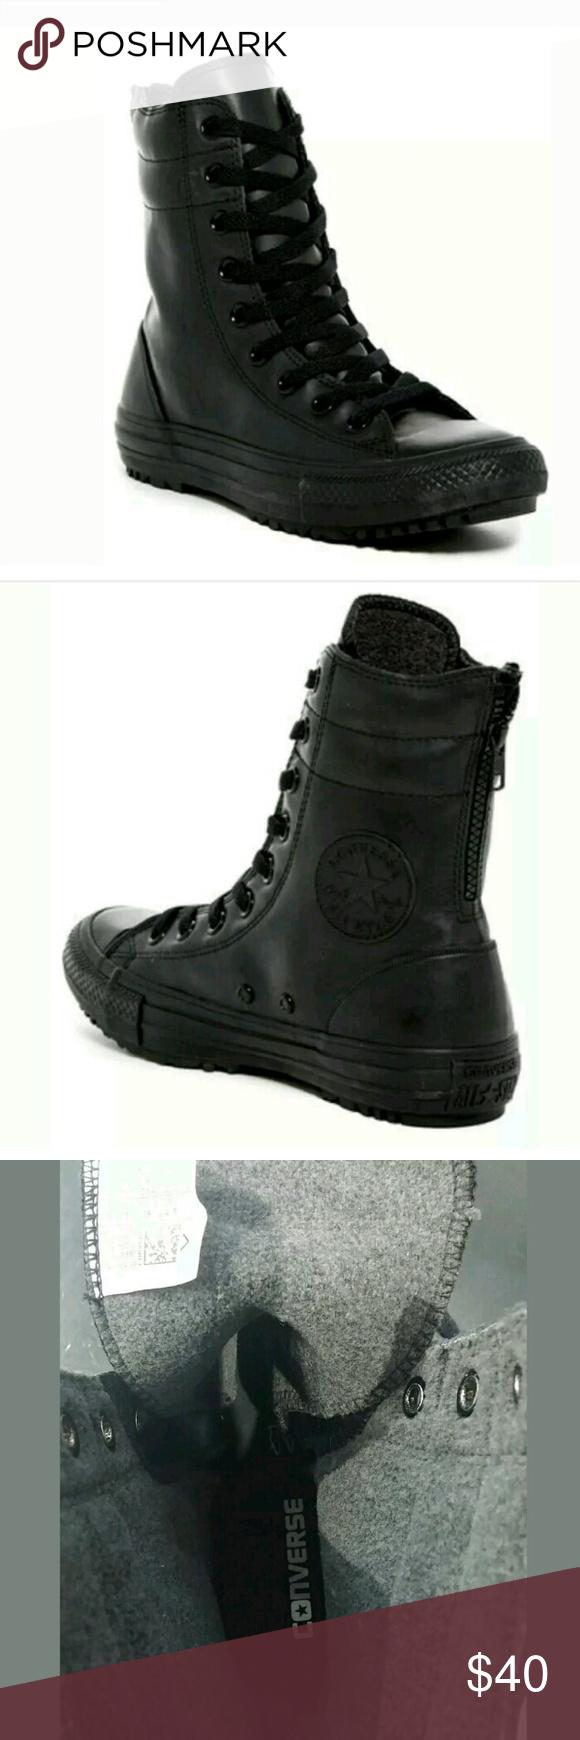 0b10eee426 NWT CONVERSE Black Rubber Moto Combat Rain Boot New in box  CONVERSE Black  Rubber Moto